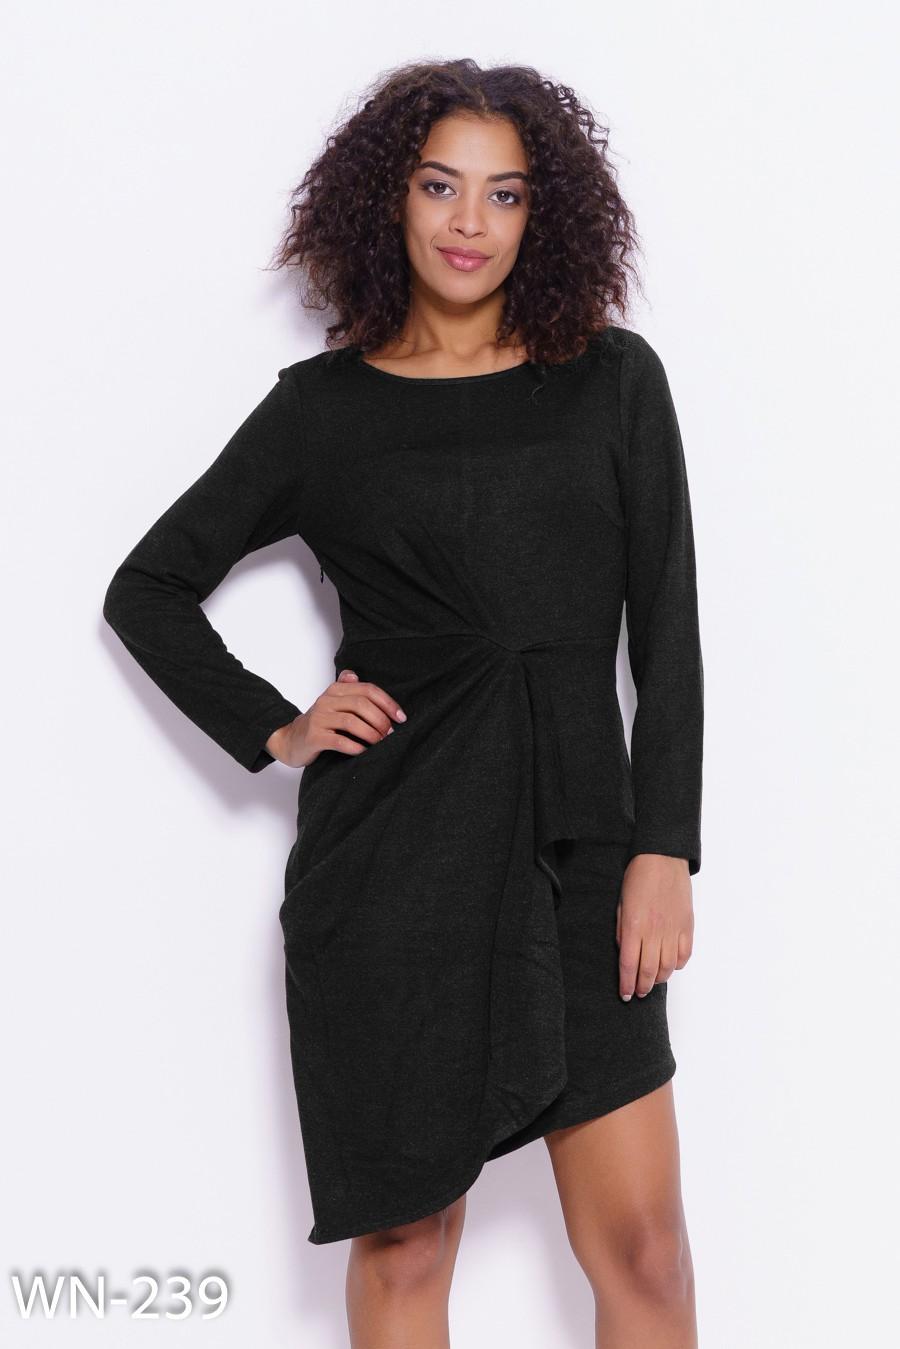 74f421b33ea Черное асимметричное платье с запахом   348 грн. фото 2 ...